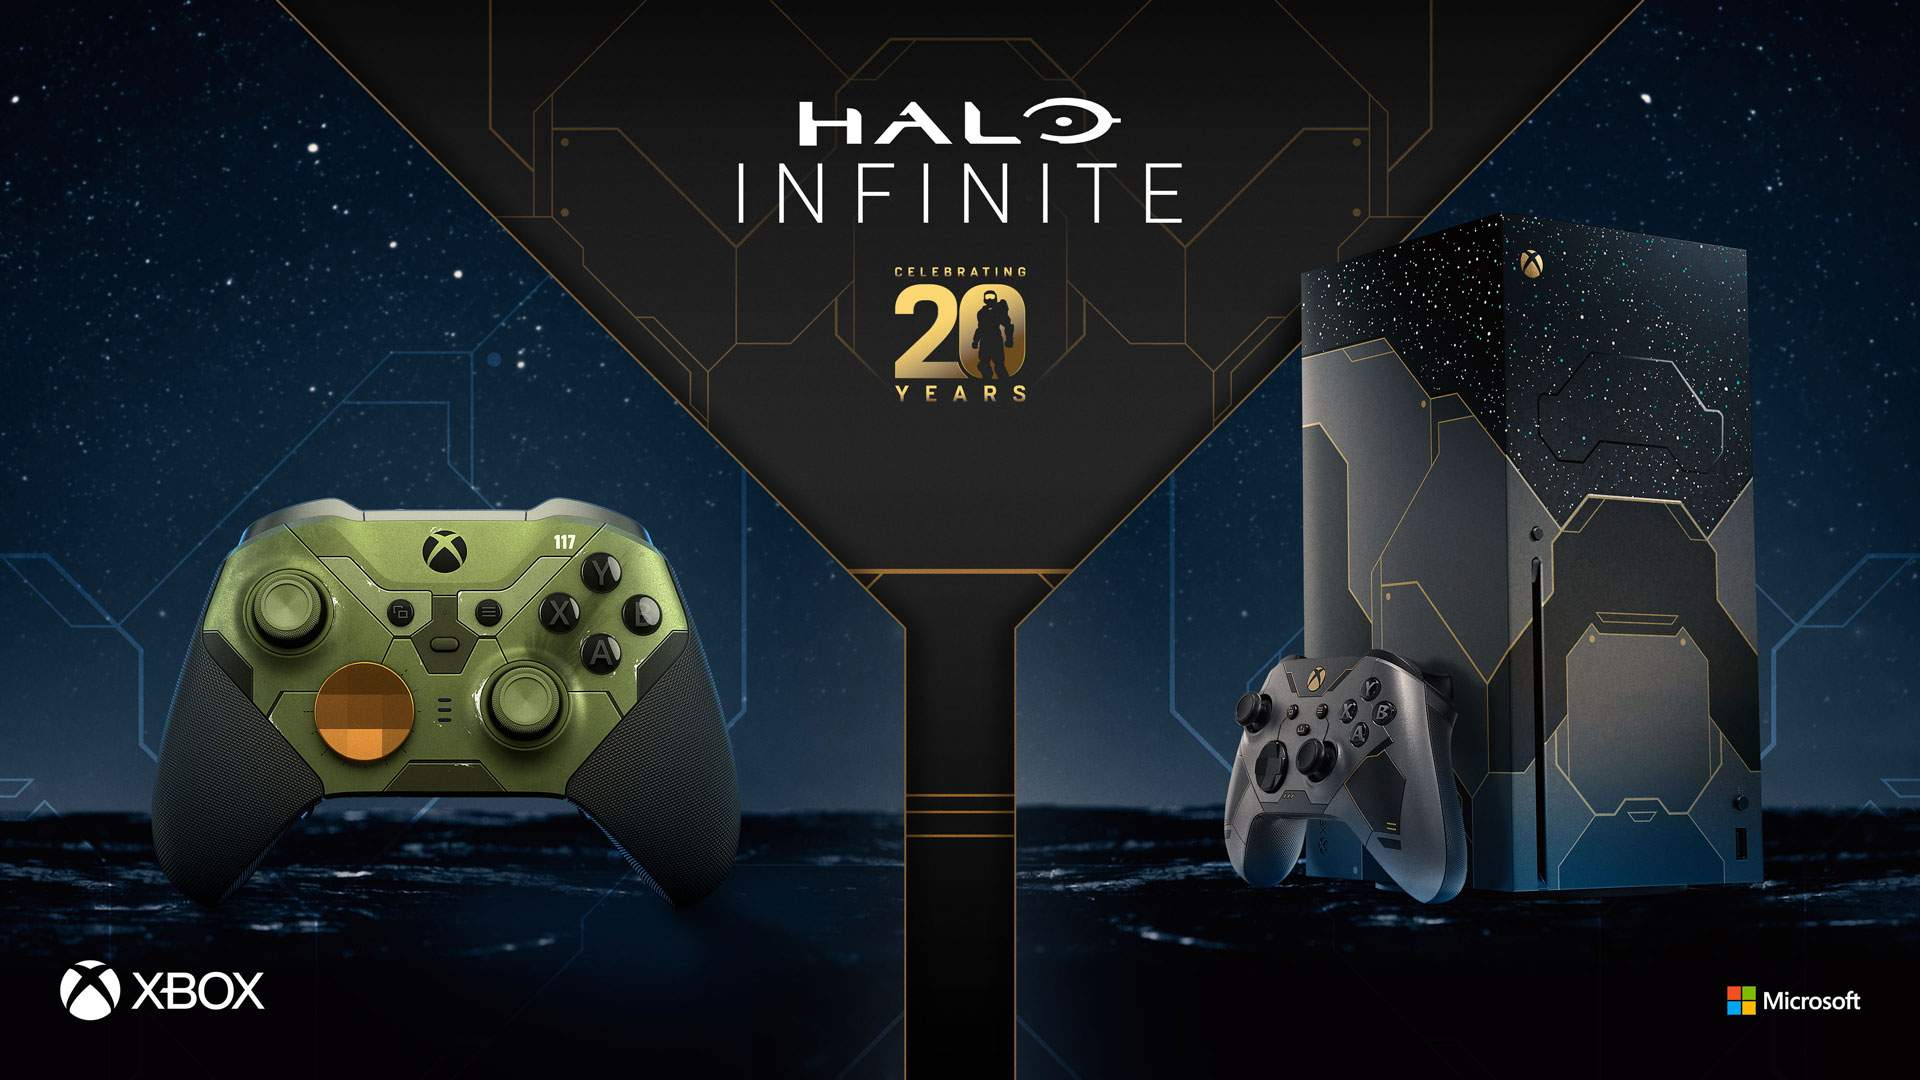 Halo Infinite 20